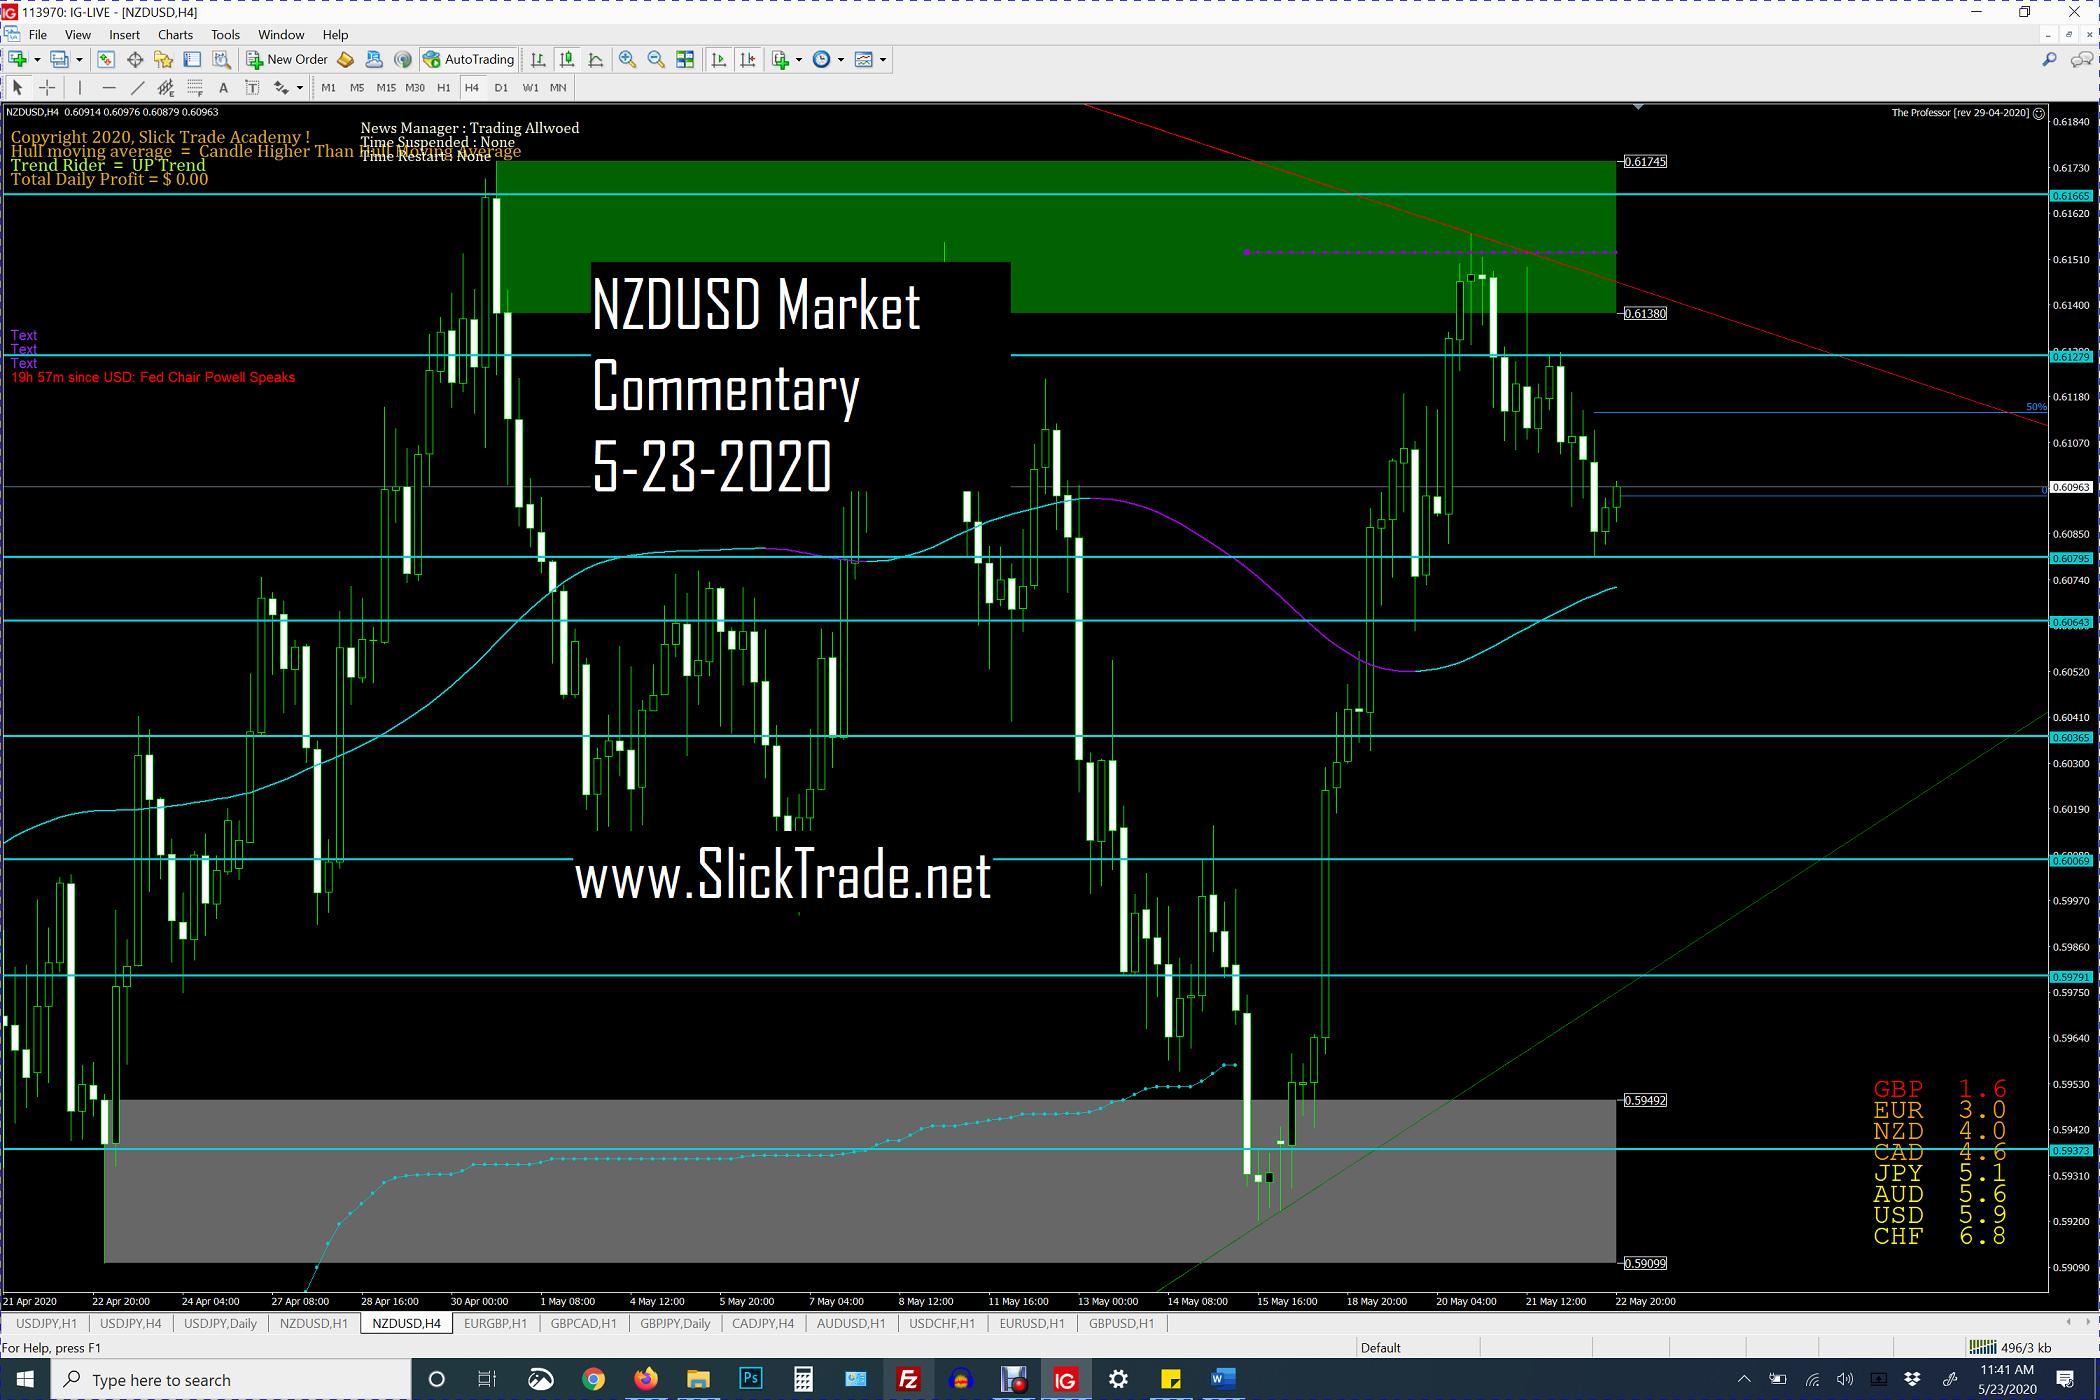 NZDUSD Market Commentary 5-23-2020